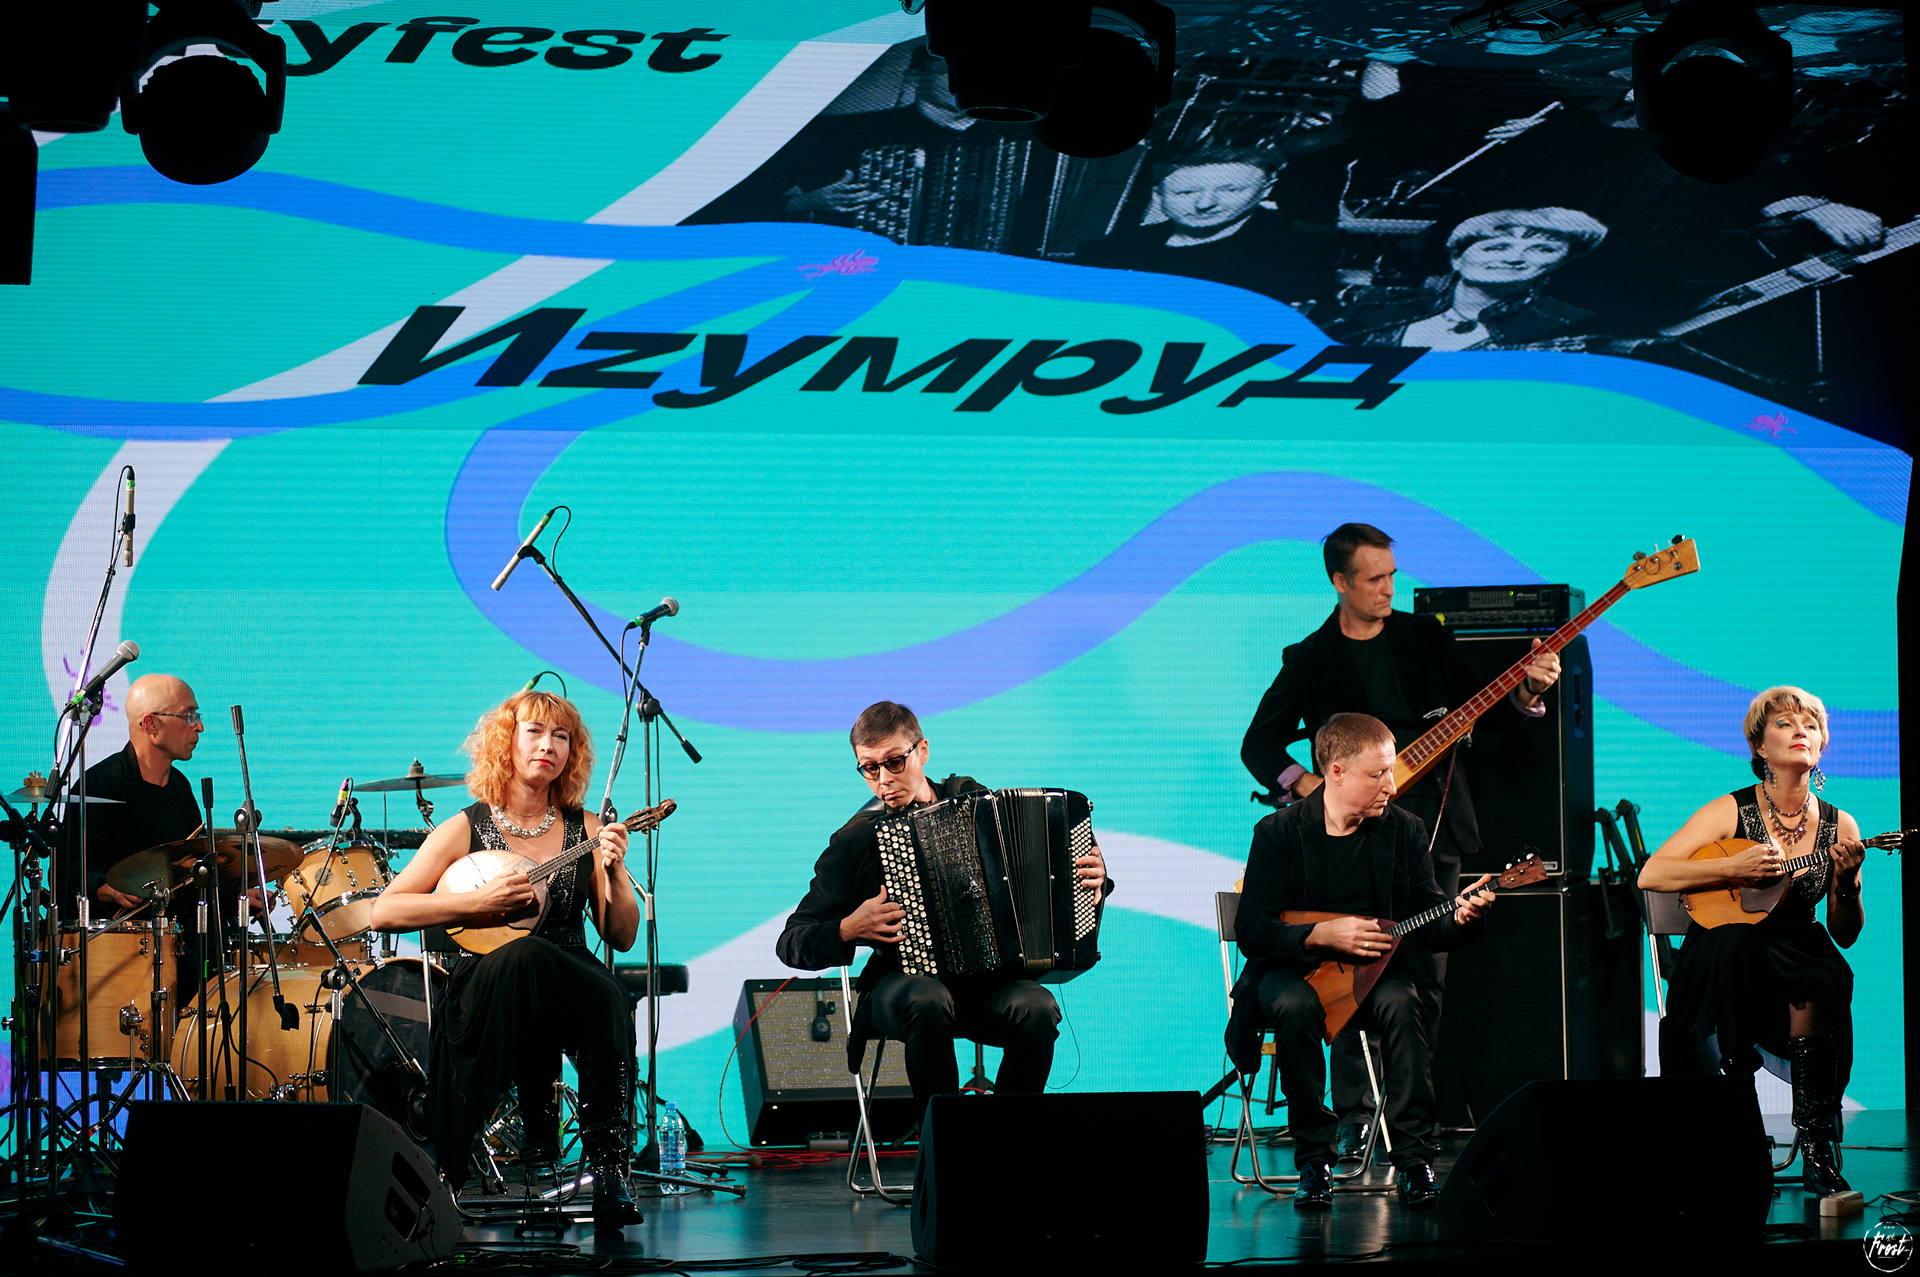 фестиваль ANTYfest, Ural Music Night ✪ Фотограф — Михаил Морозов